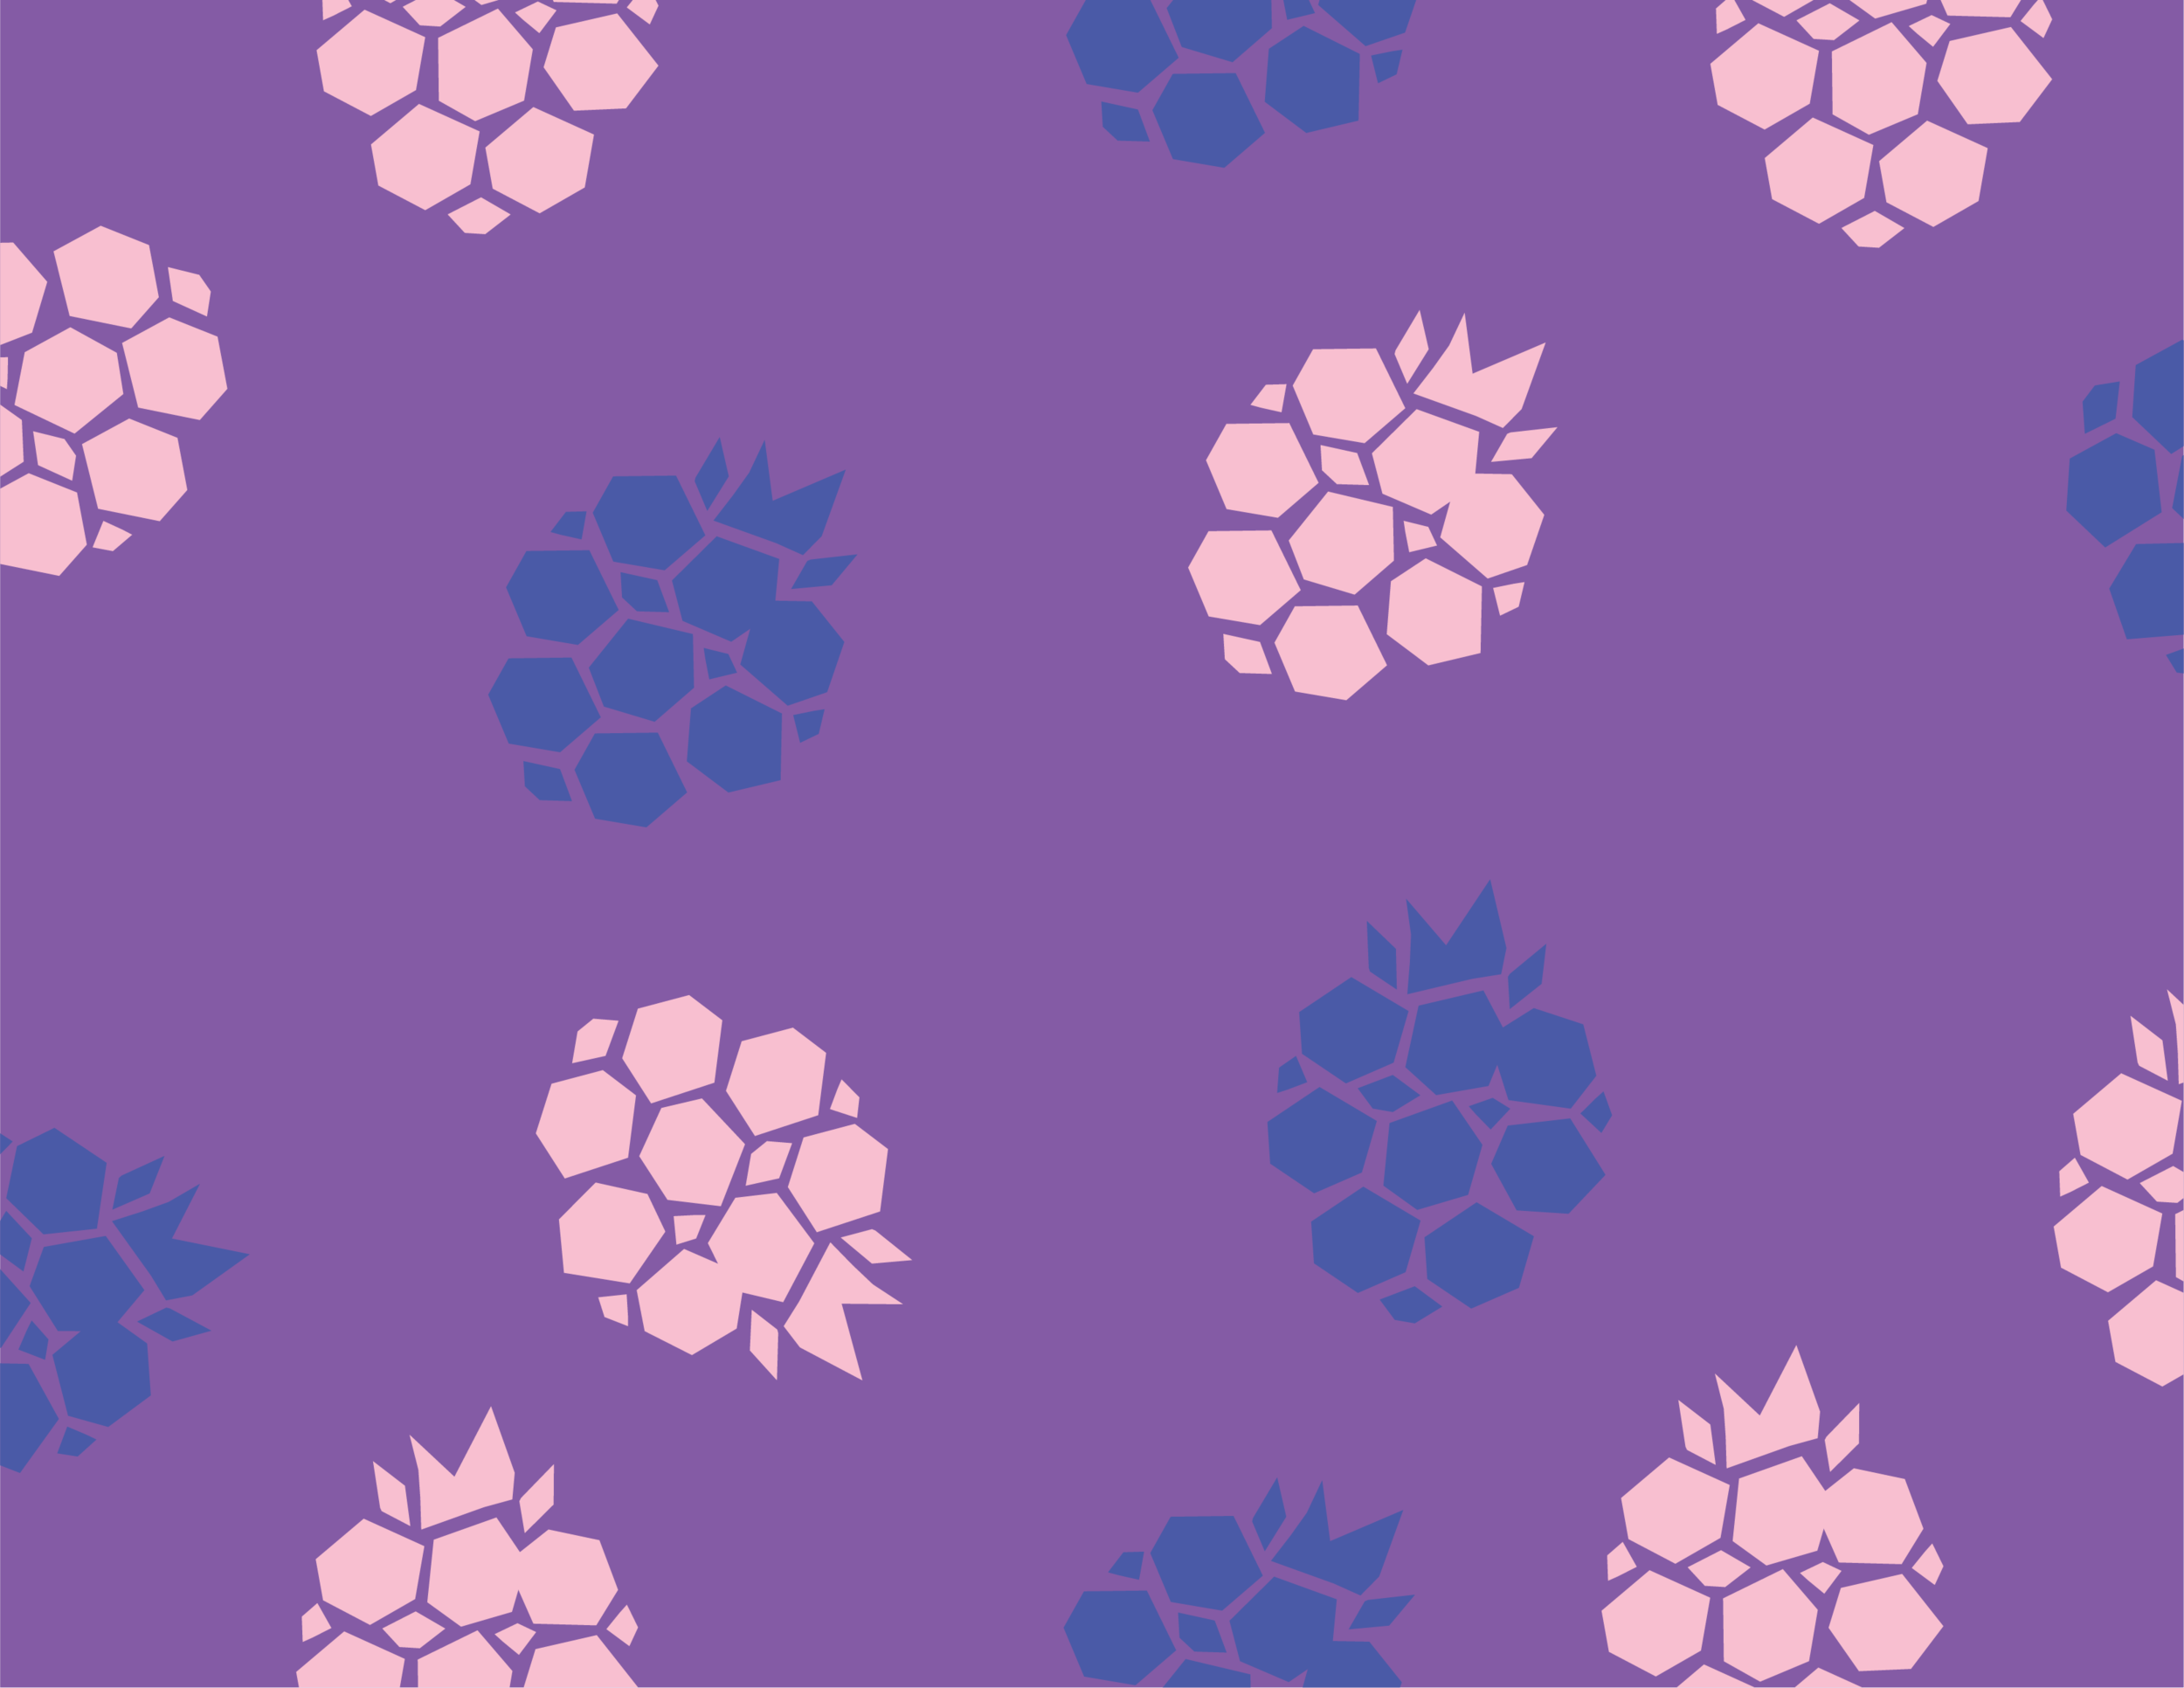 ICJ_Patterns_Berries_RGB.png